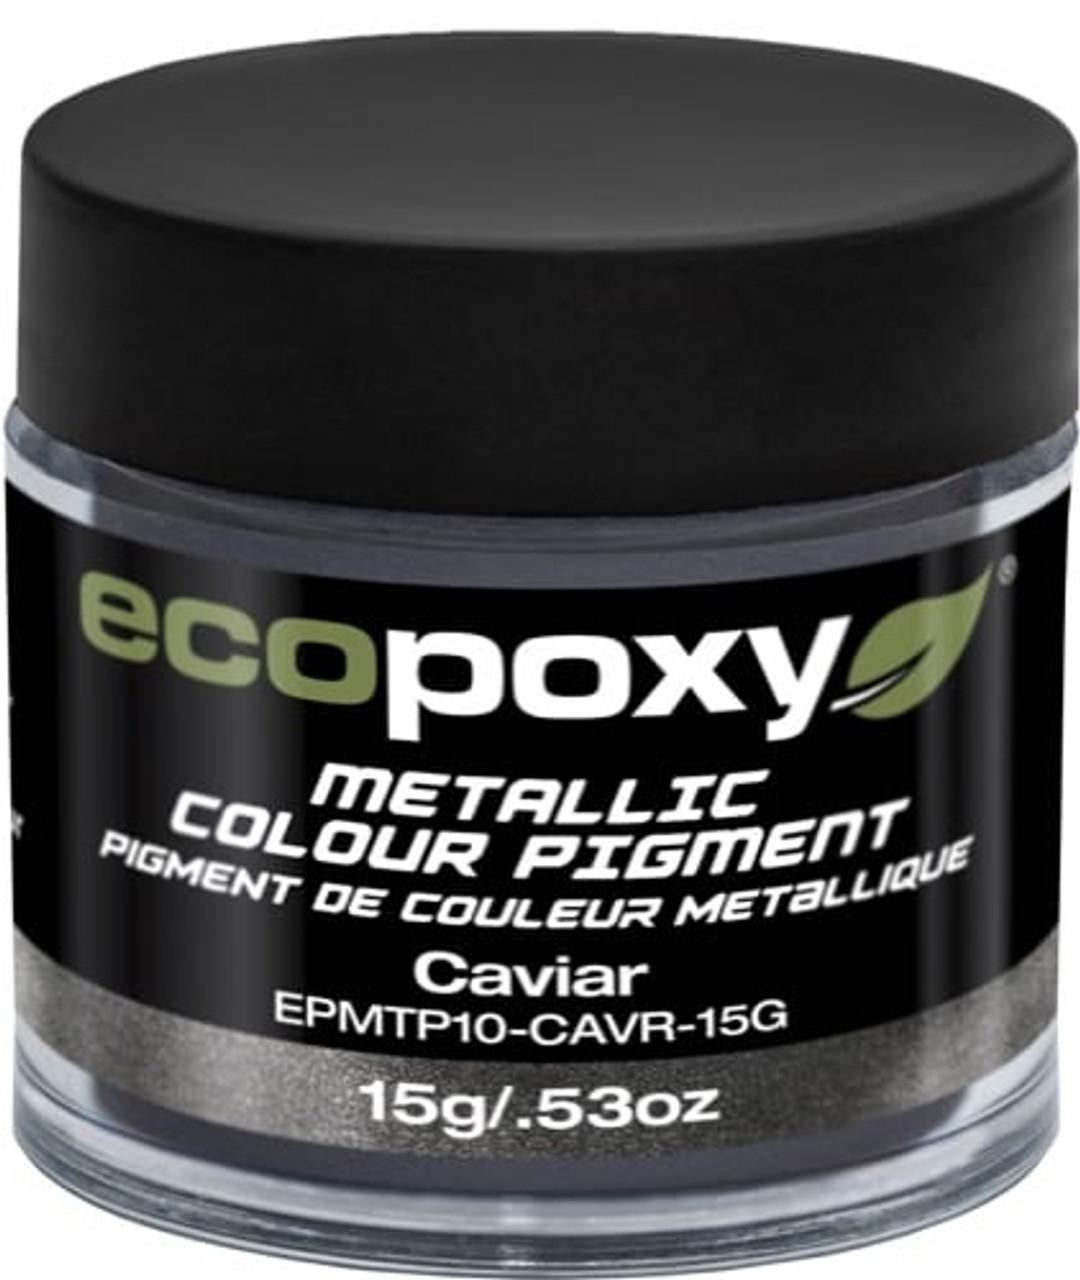 EcoPoxy - 45g Metallic ColorPigment - Caviar (628199907100)